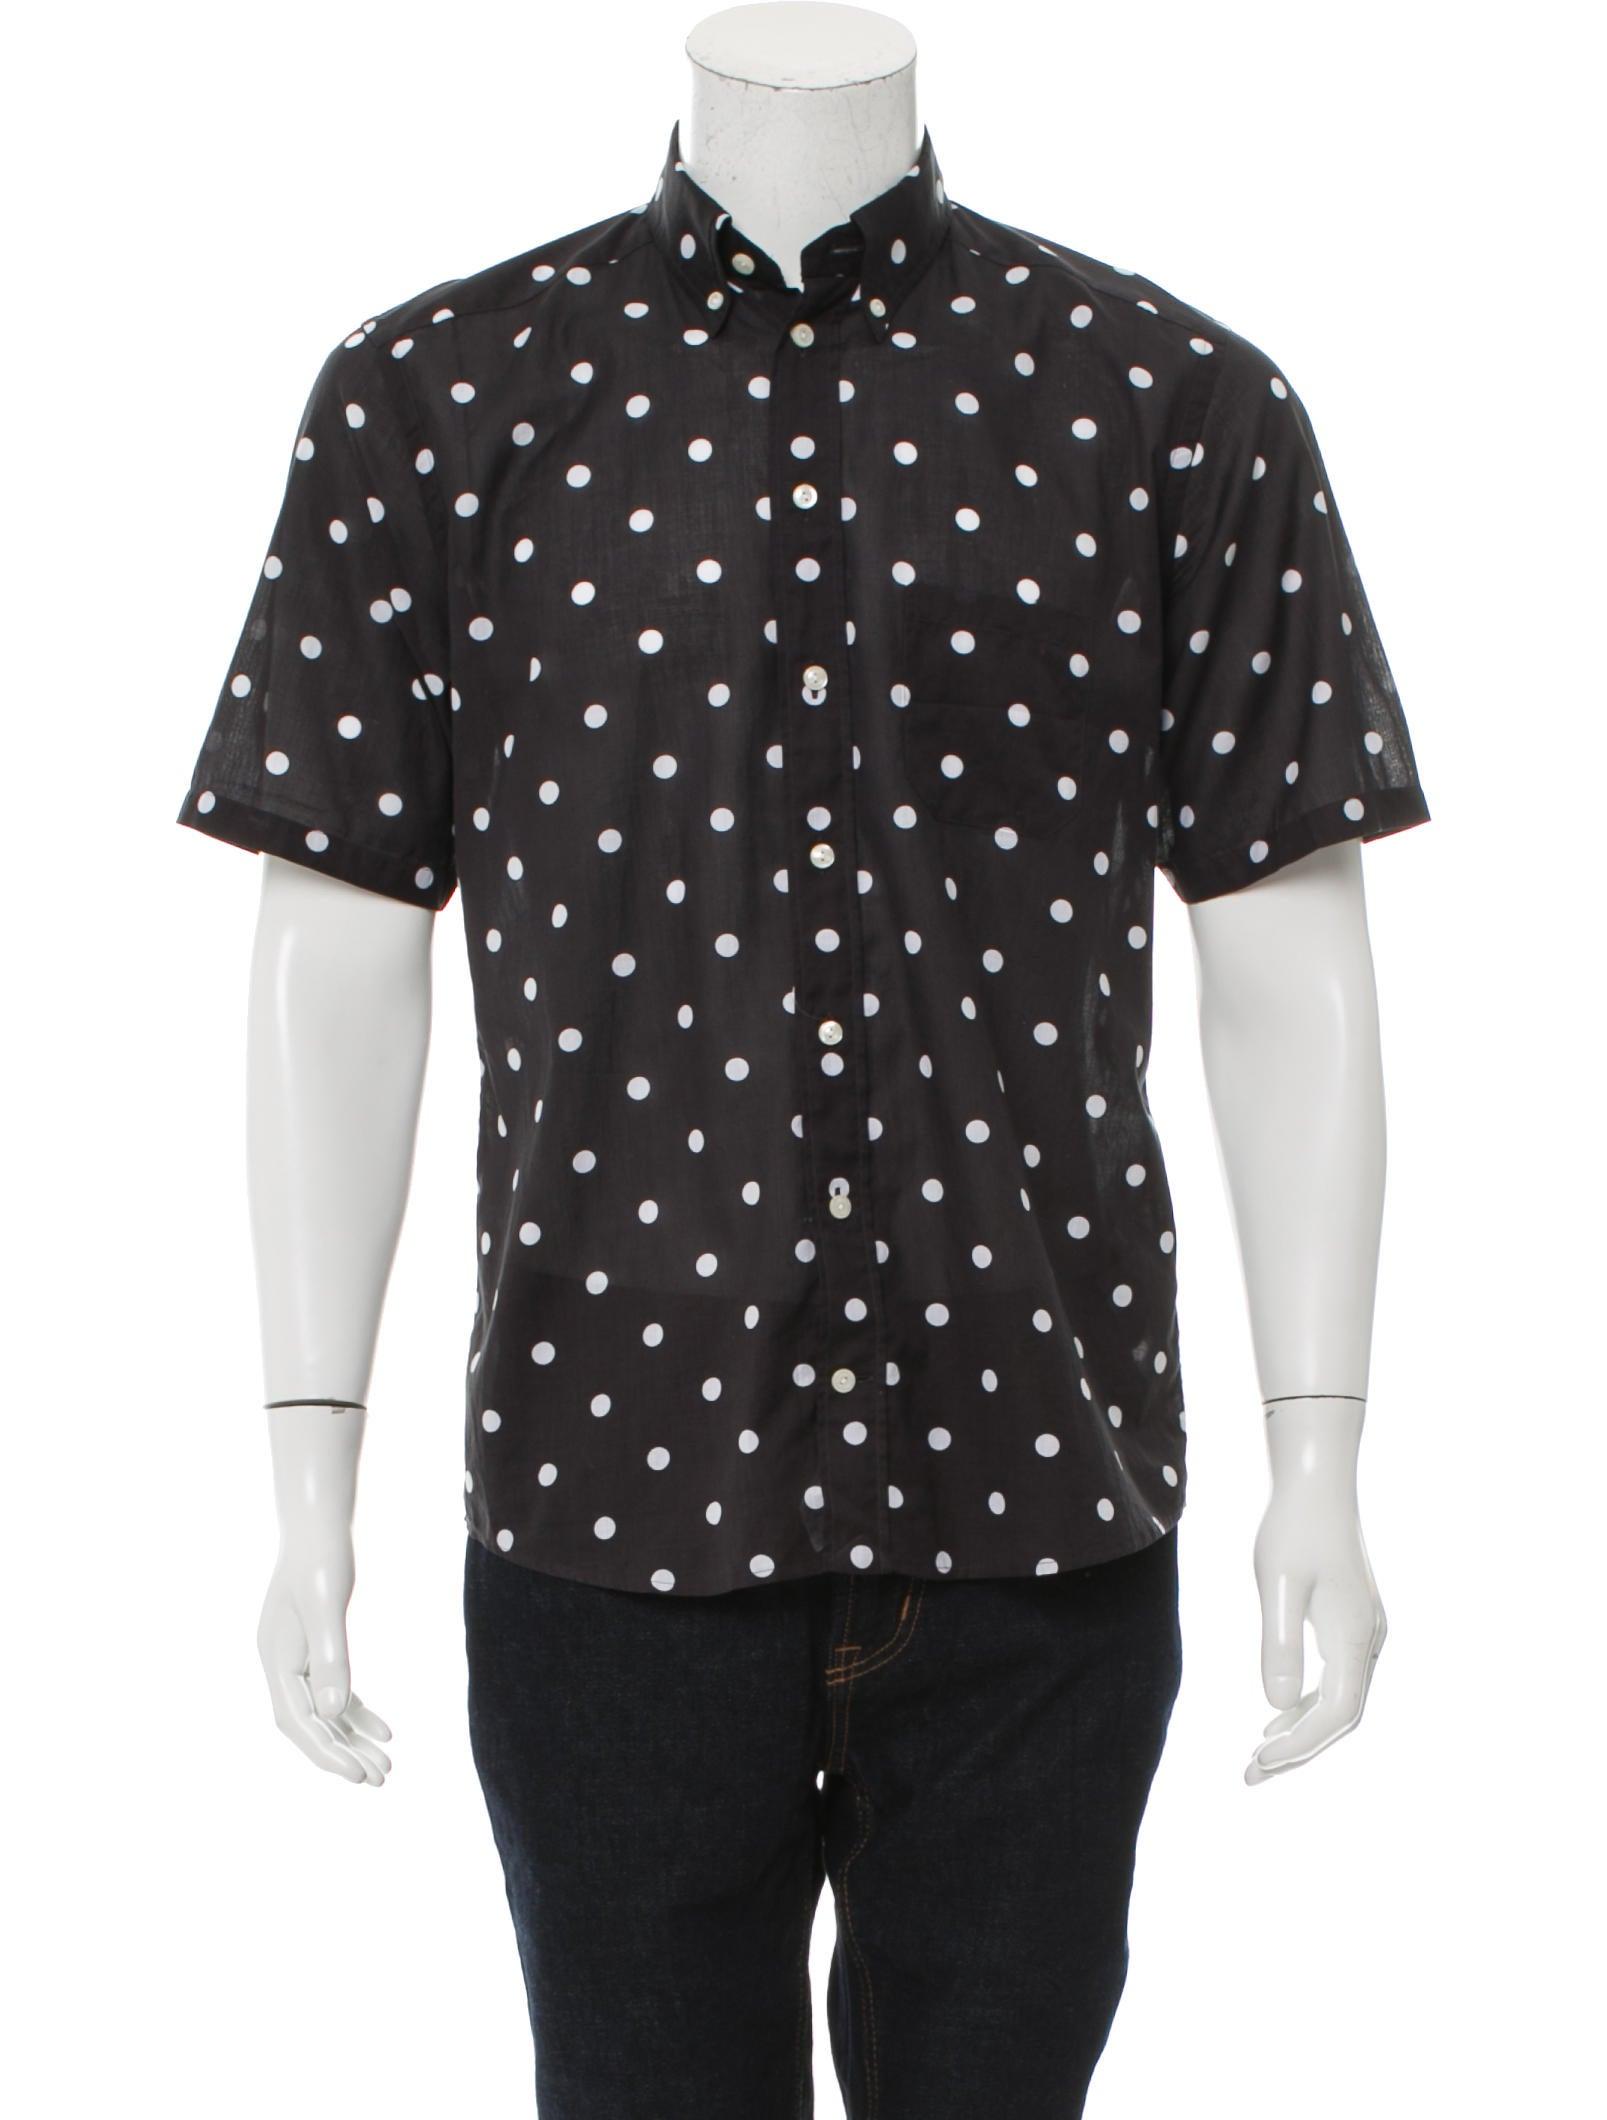 Black and White Polka Dot Shirt with Khaki Shorts. source. As a minimal and stylish summer casual outfit, you can wear a black and white polka dot shirt with khaki shorts.